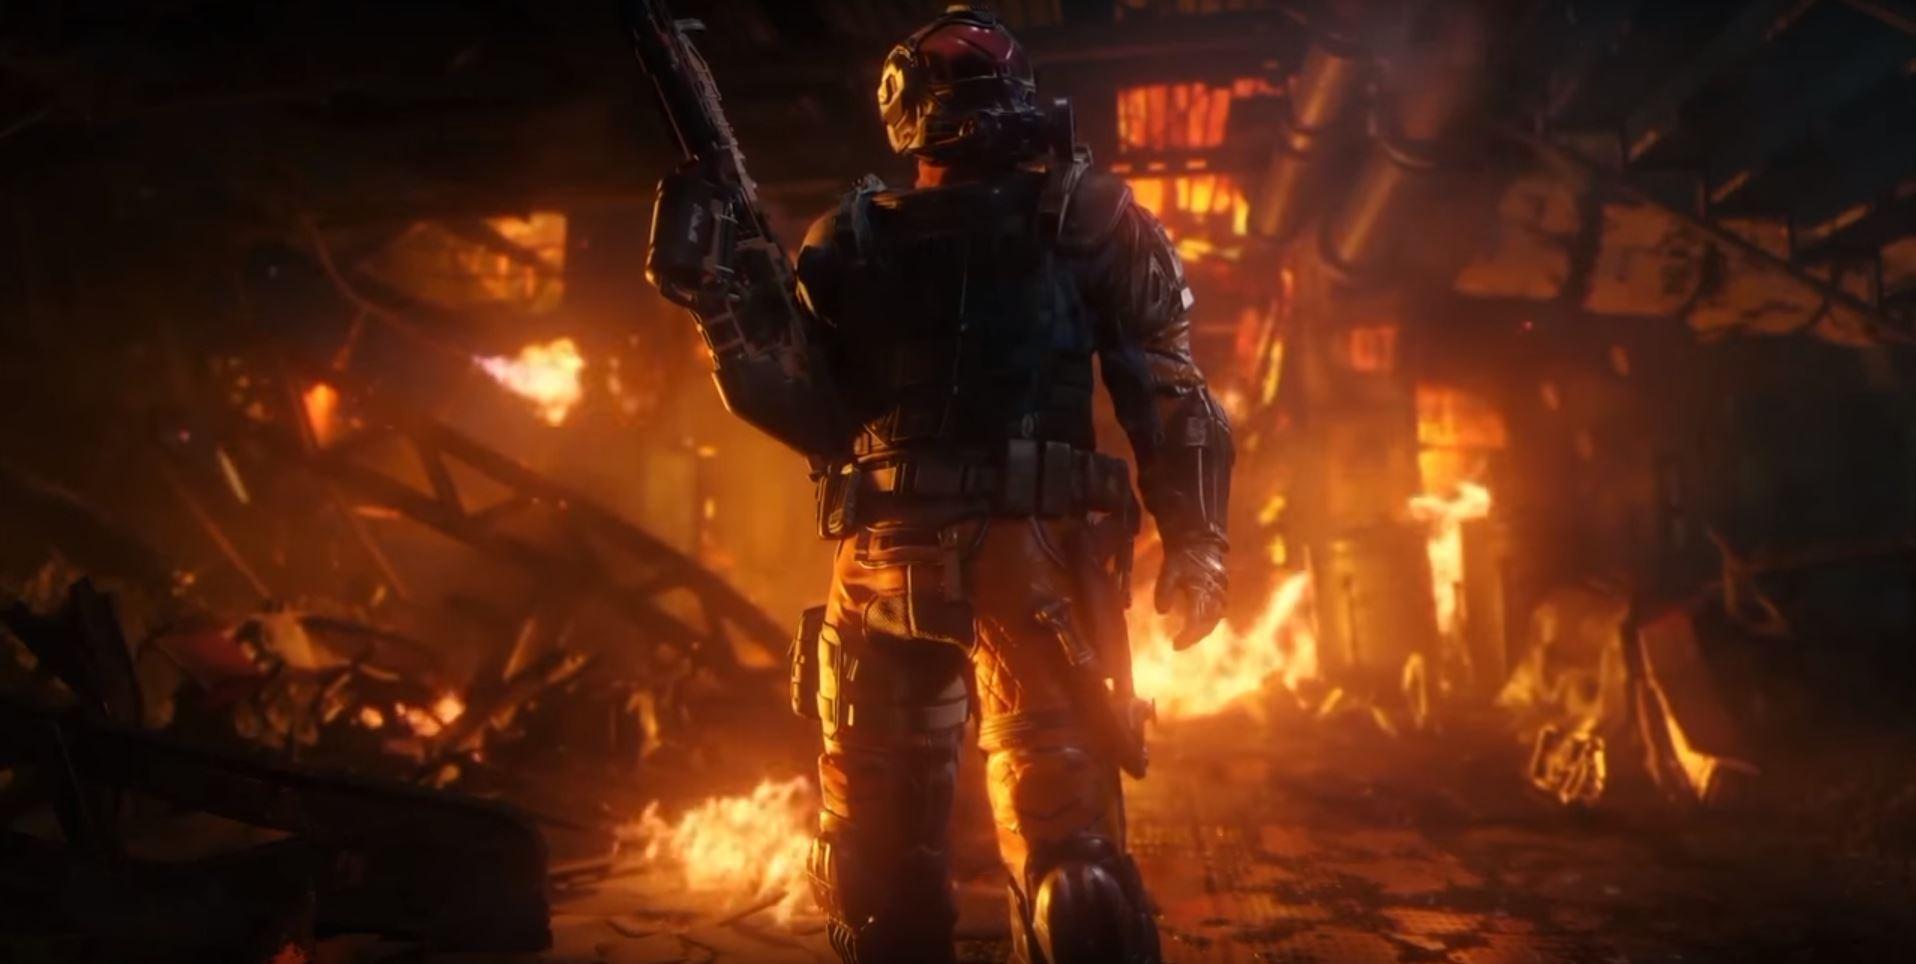 Wallpaper Fire Call Of Duty Black Ops Iii Black Ops 3